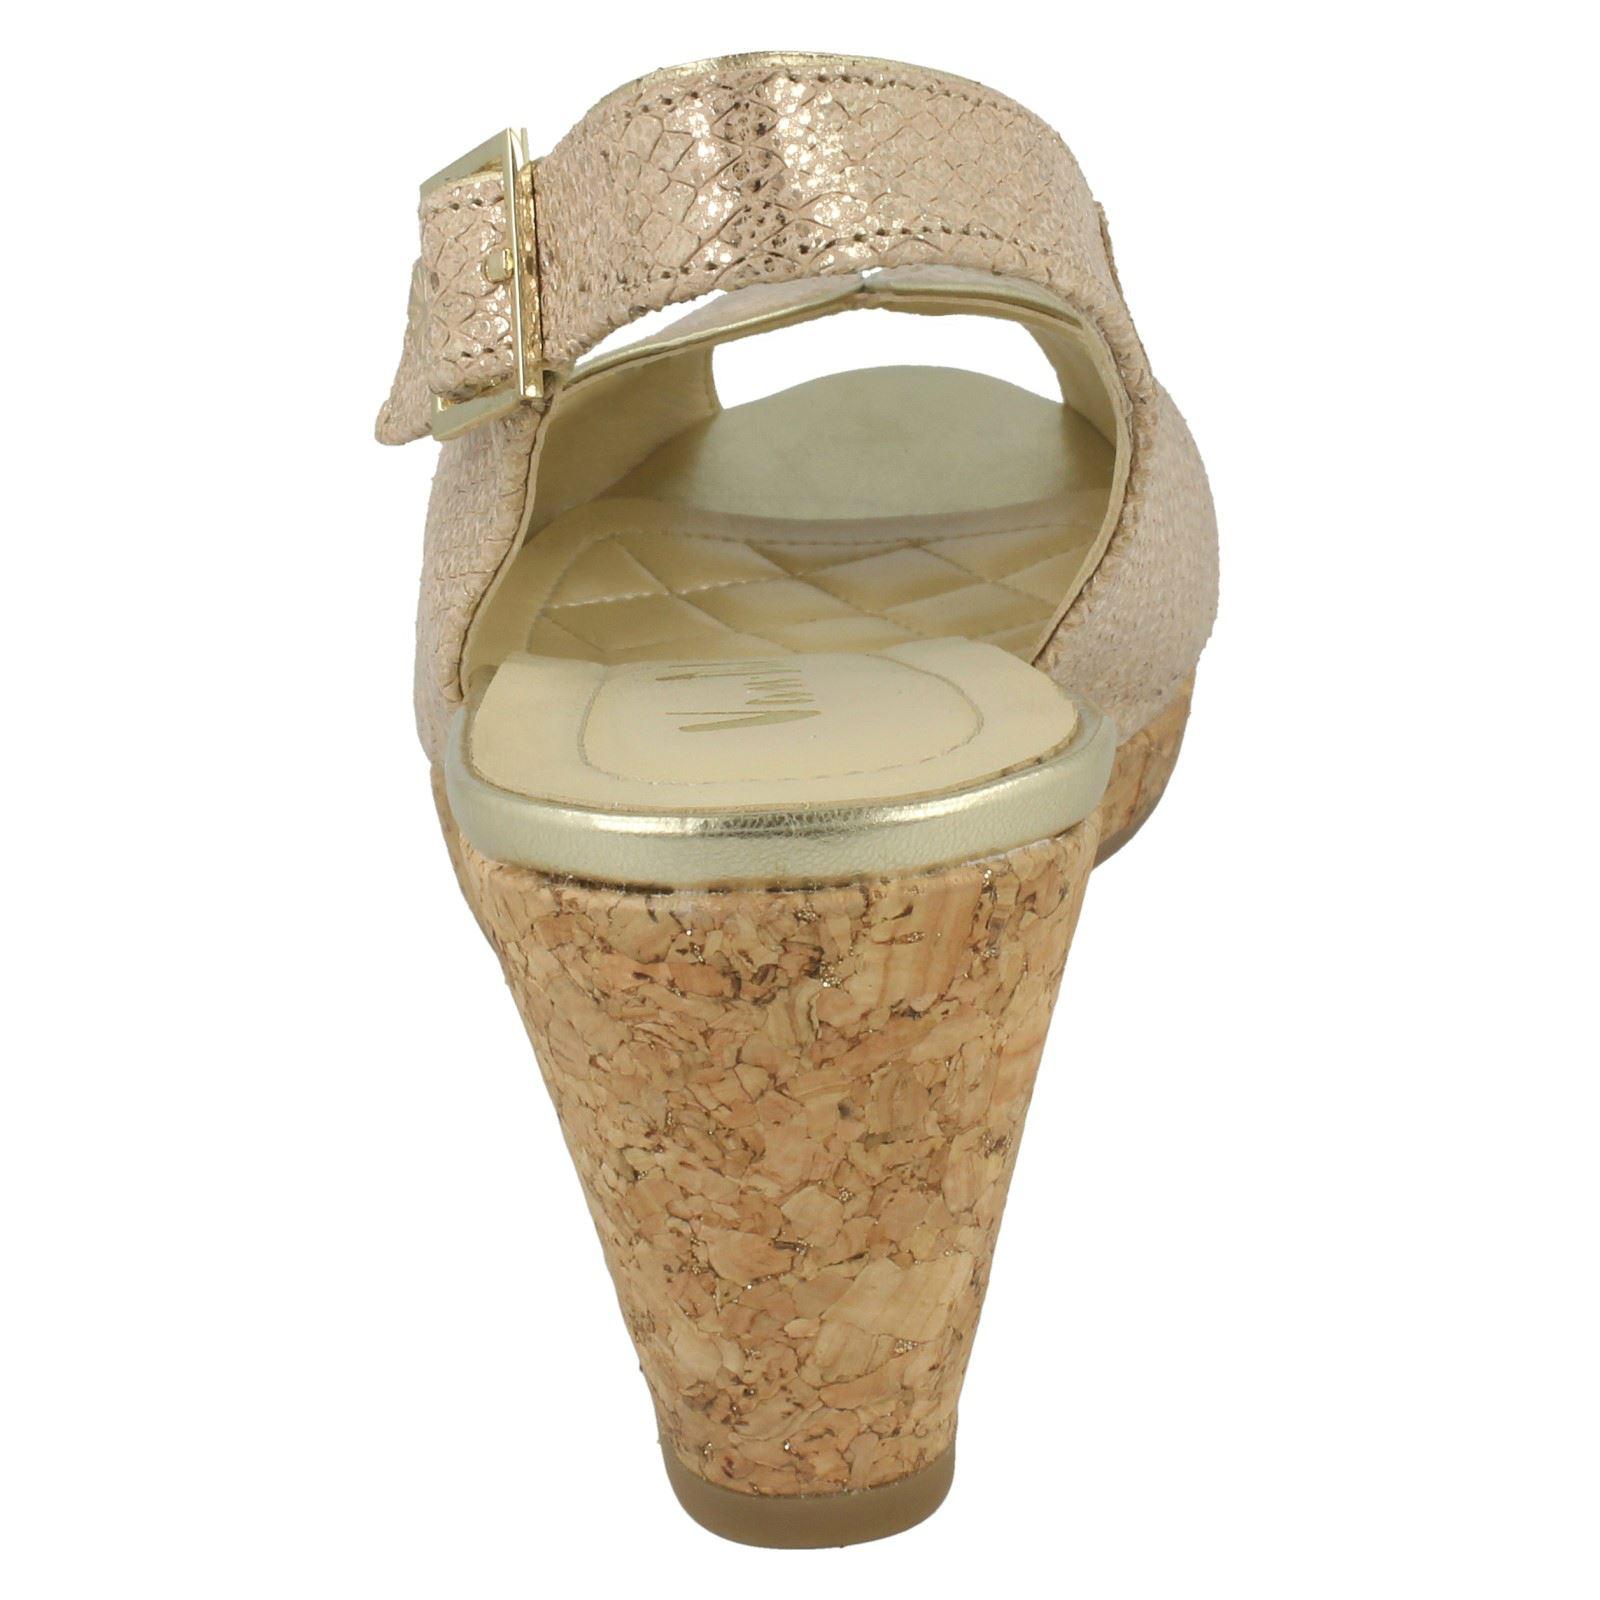 Ladies-Van-Dal-Cork-Wedge-Sandals-Gable thumbnail 4